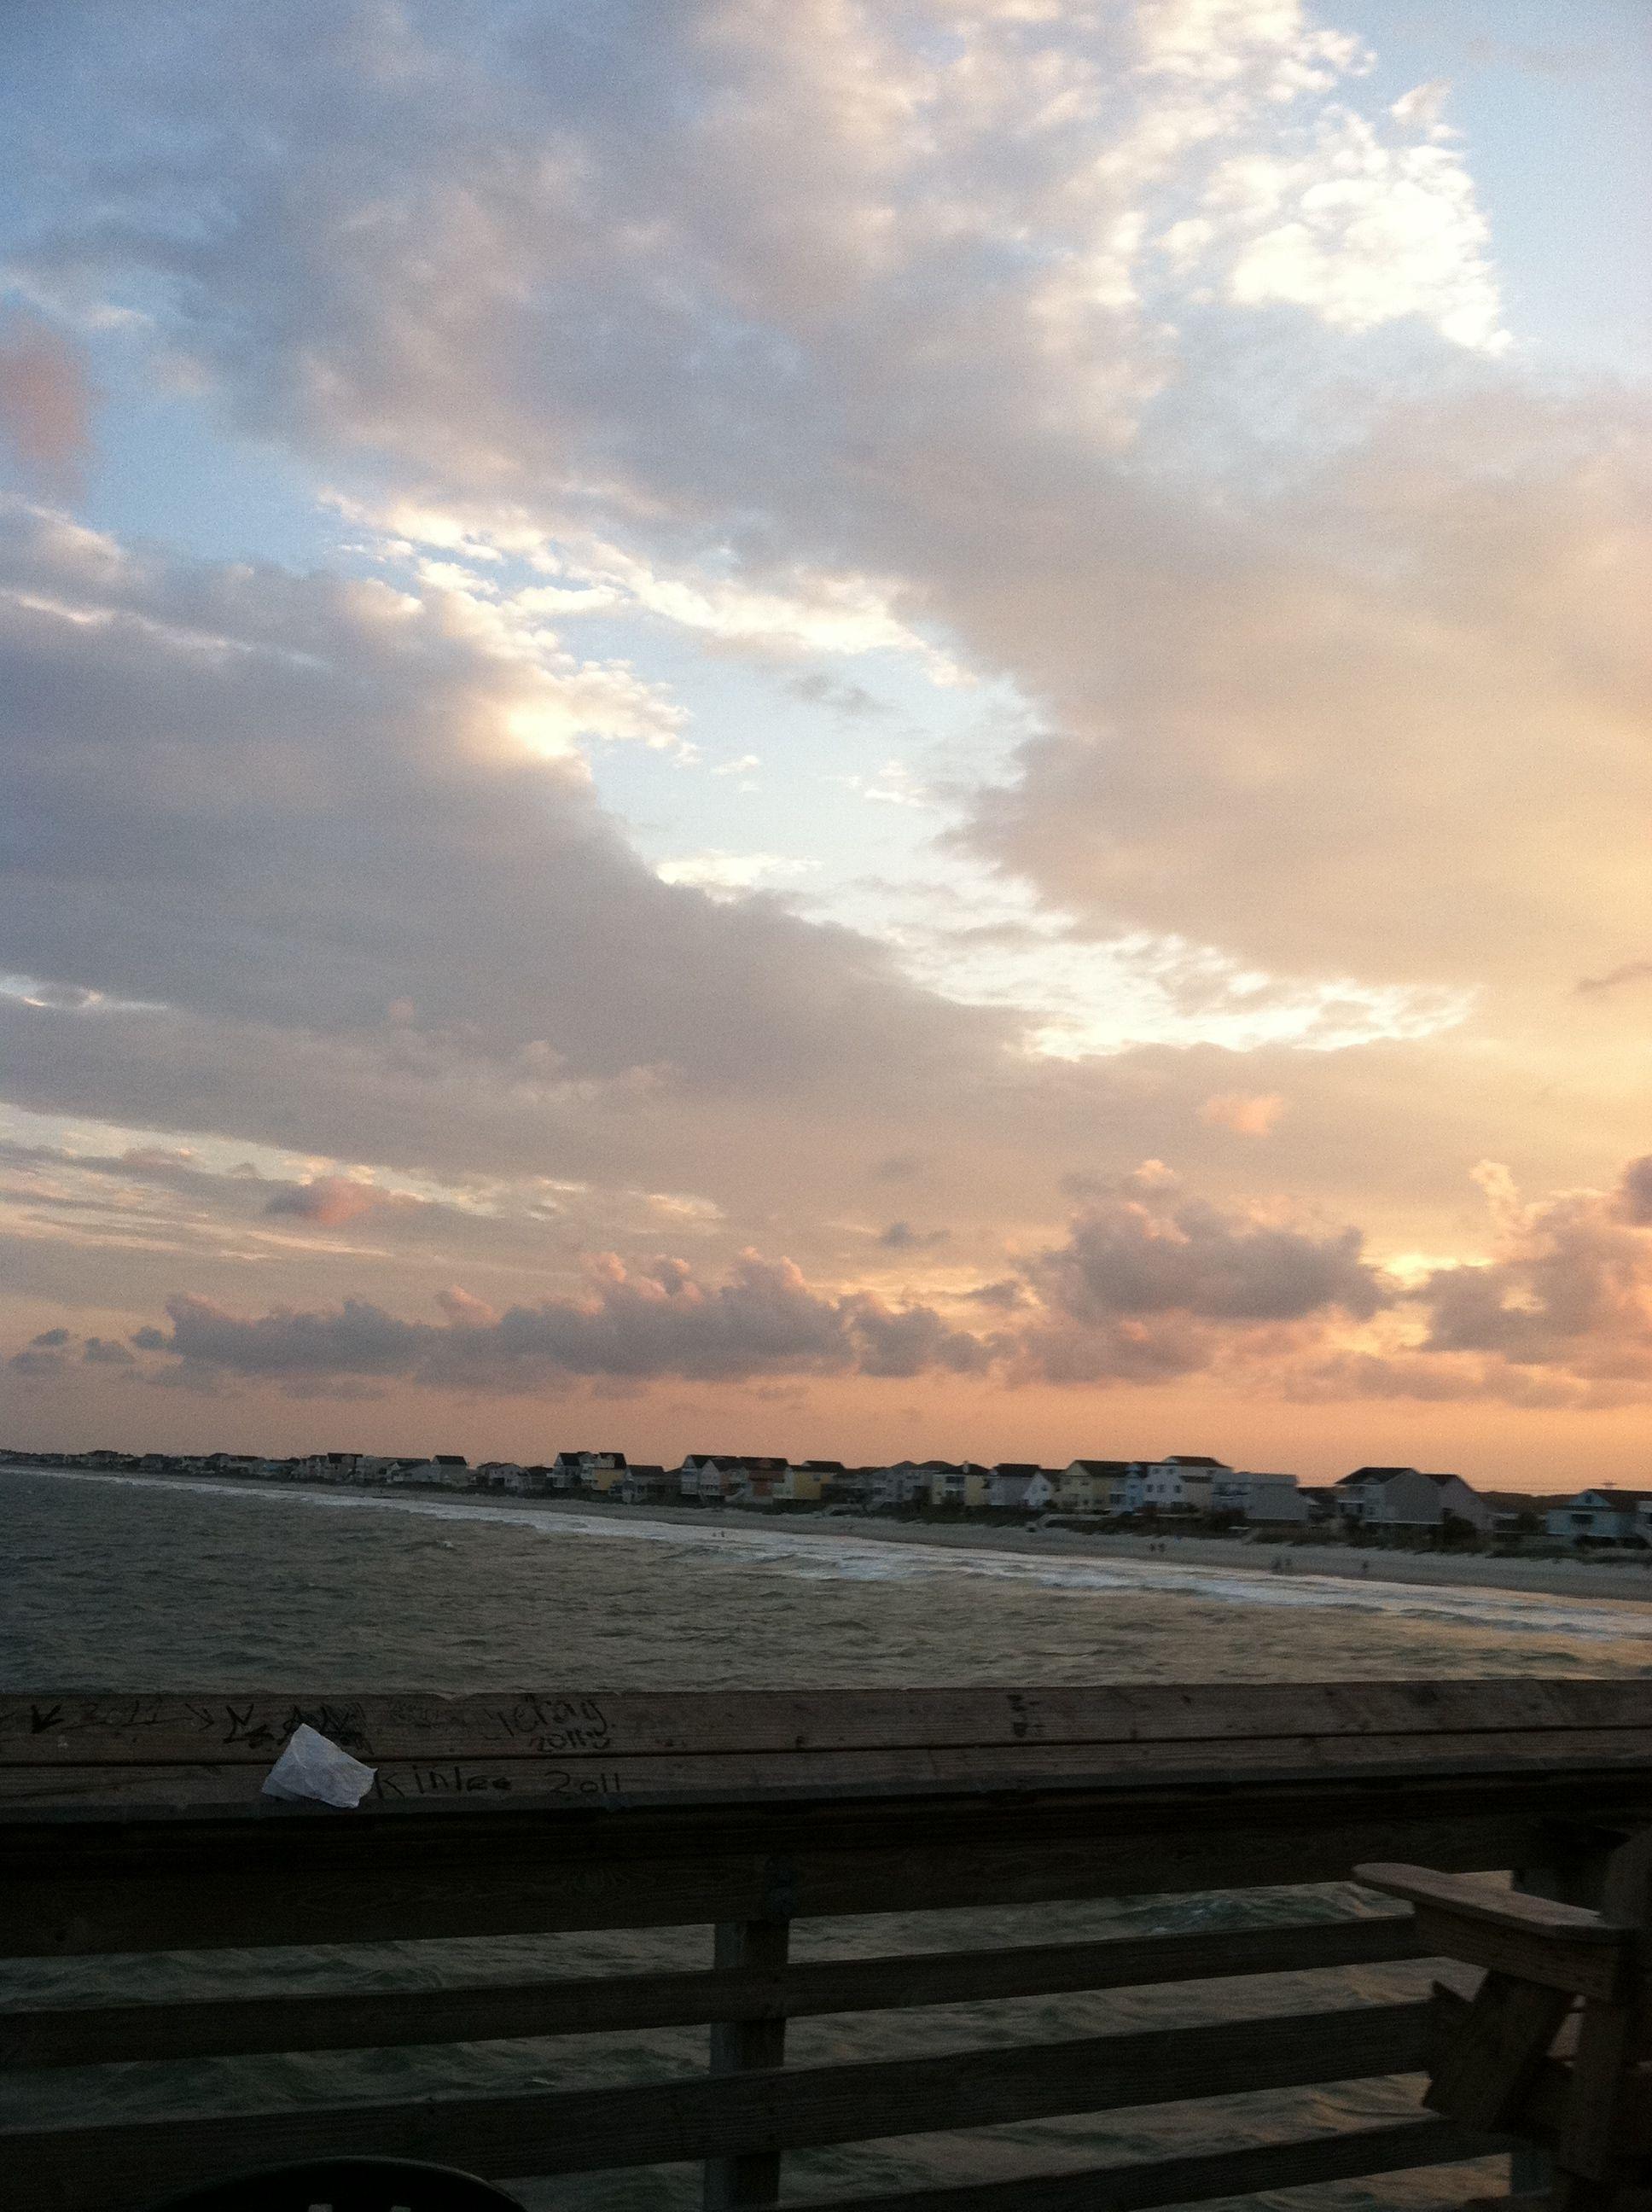 The sky at sunset, Surfside SC